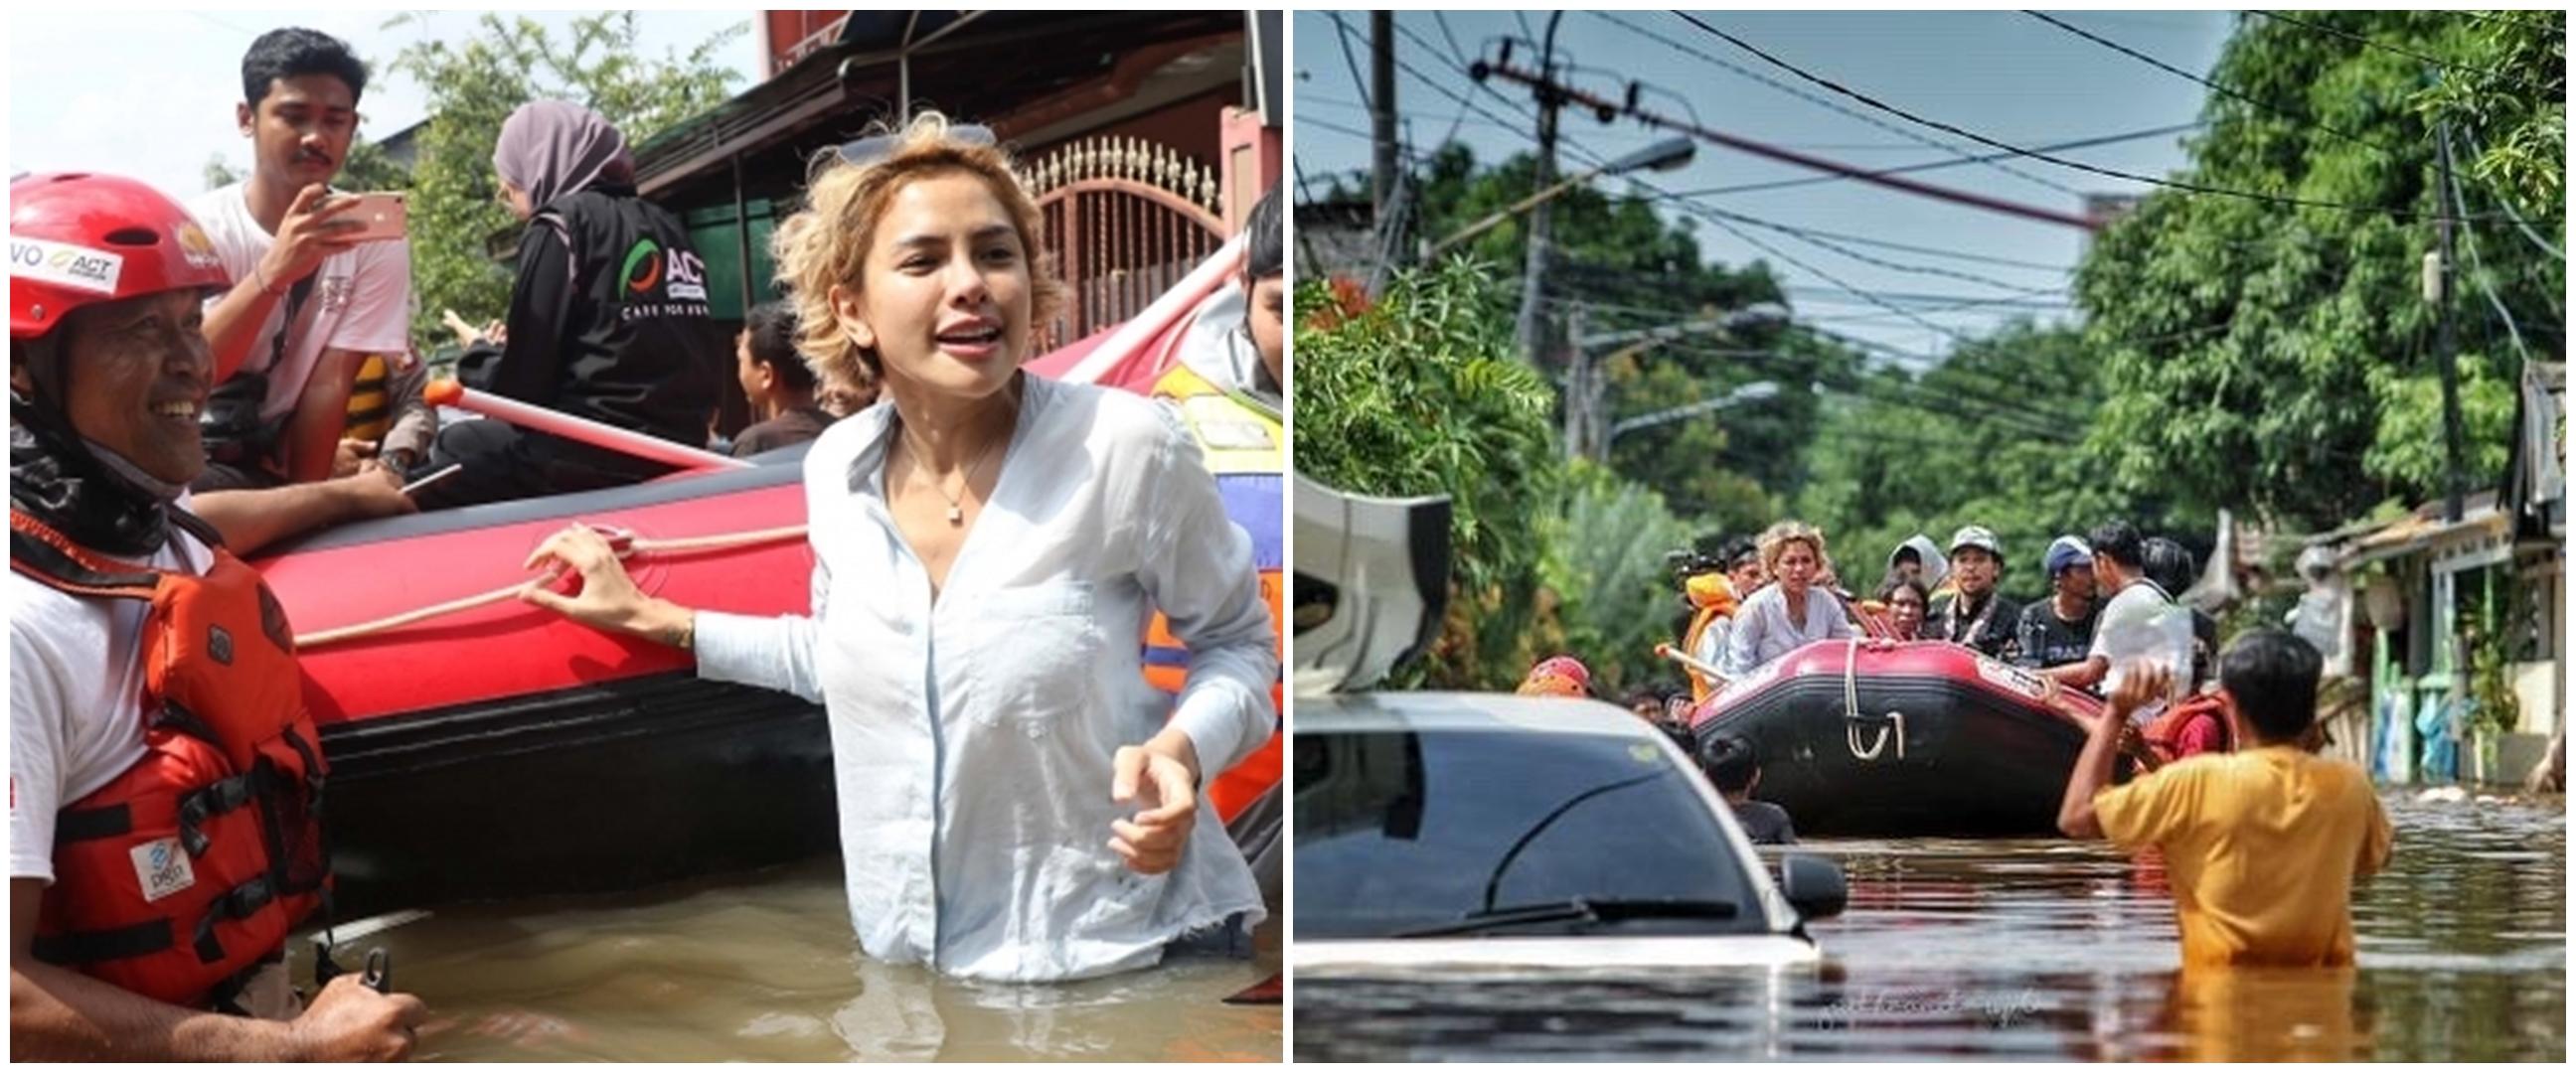 Aksi 5 seleb bantu korban banjir Jakarta, bikin salut